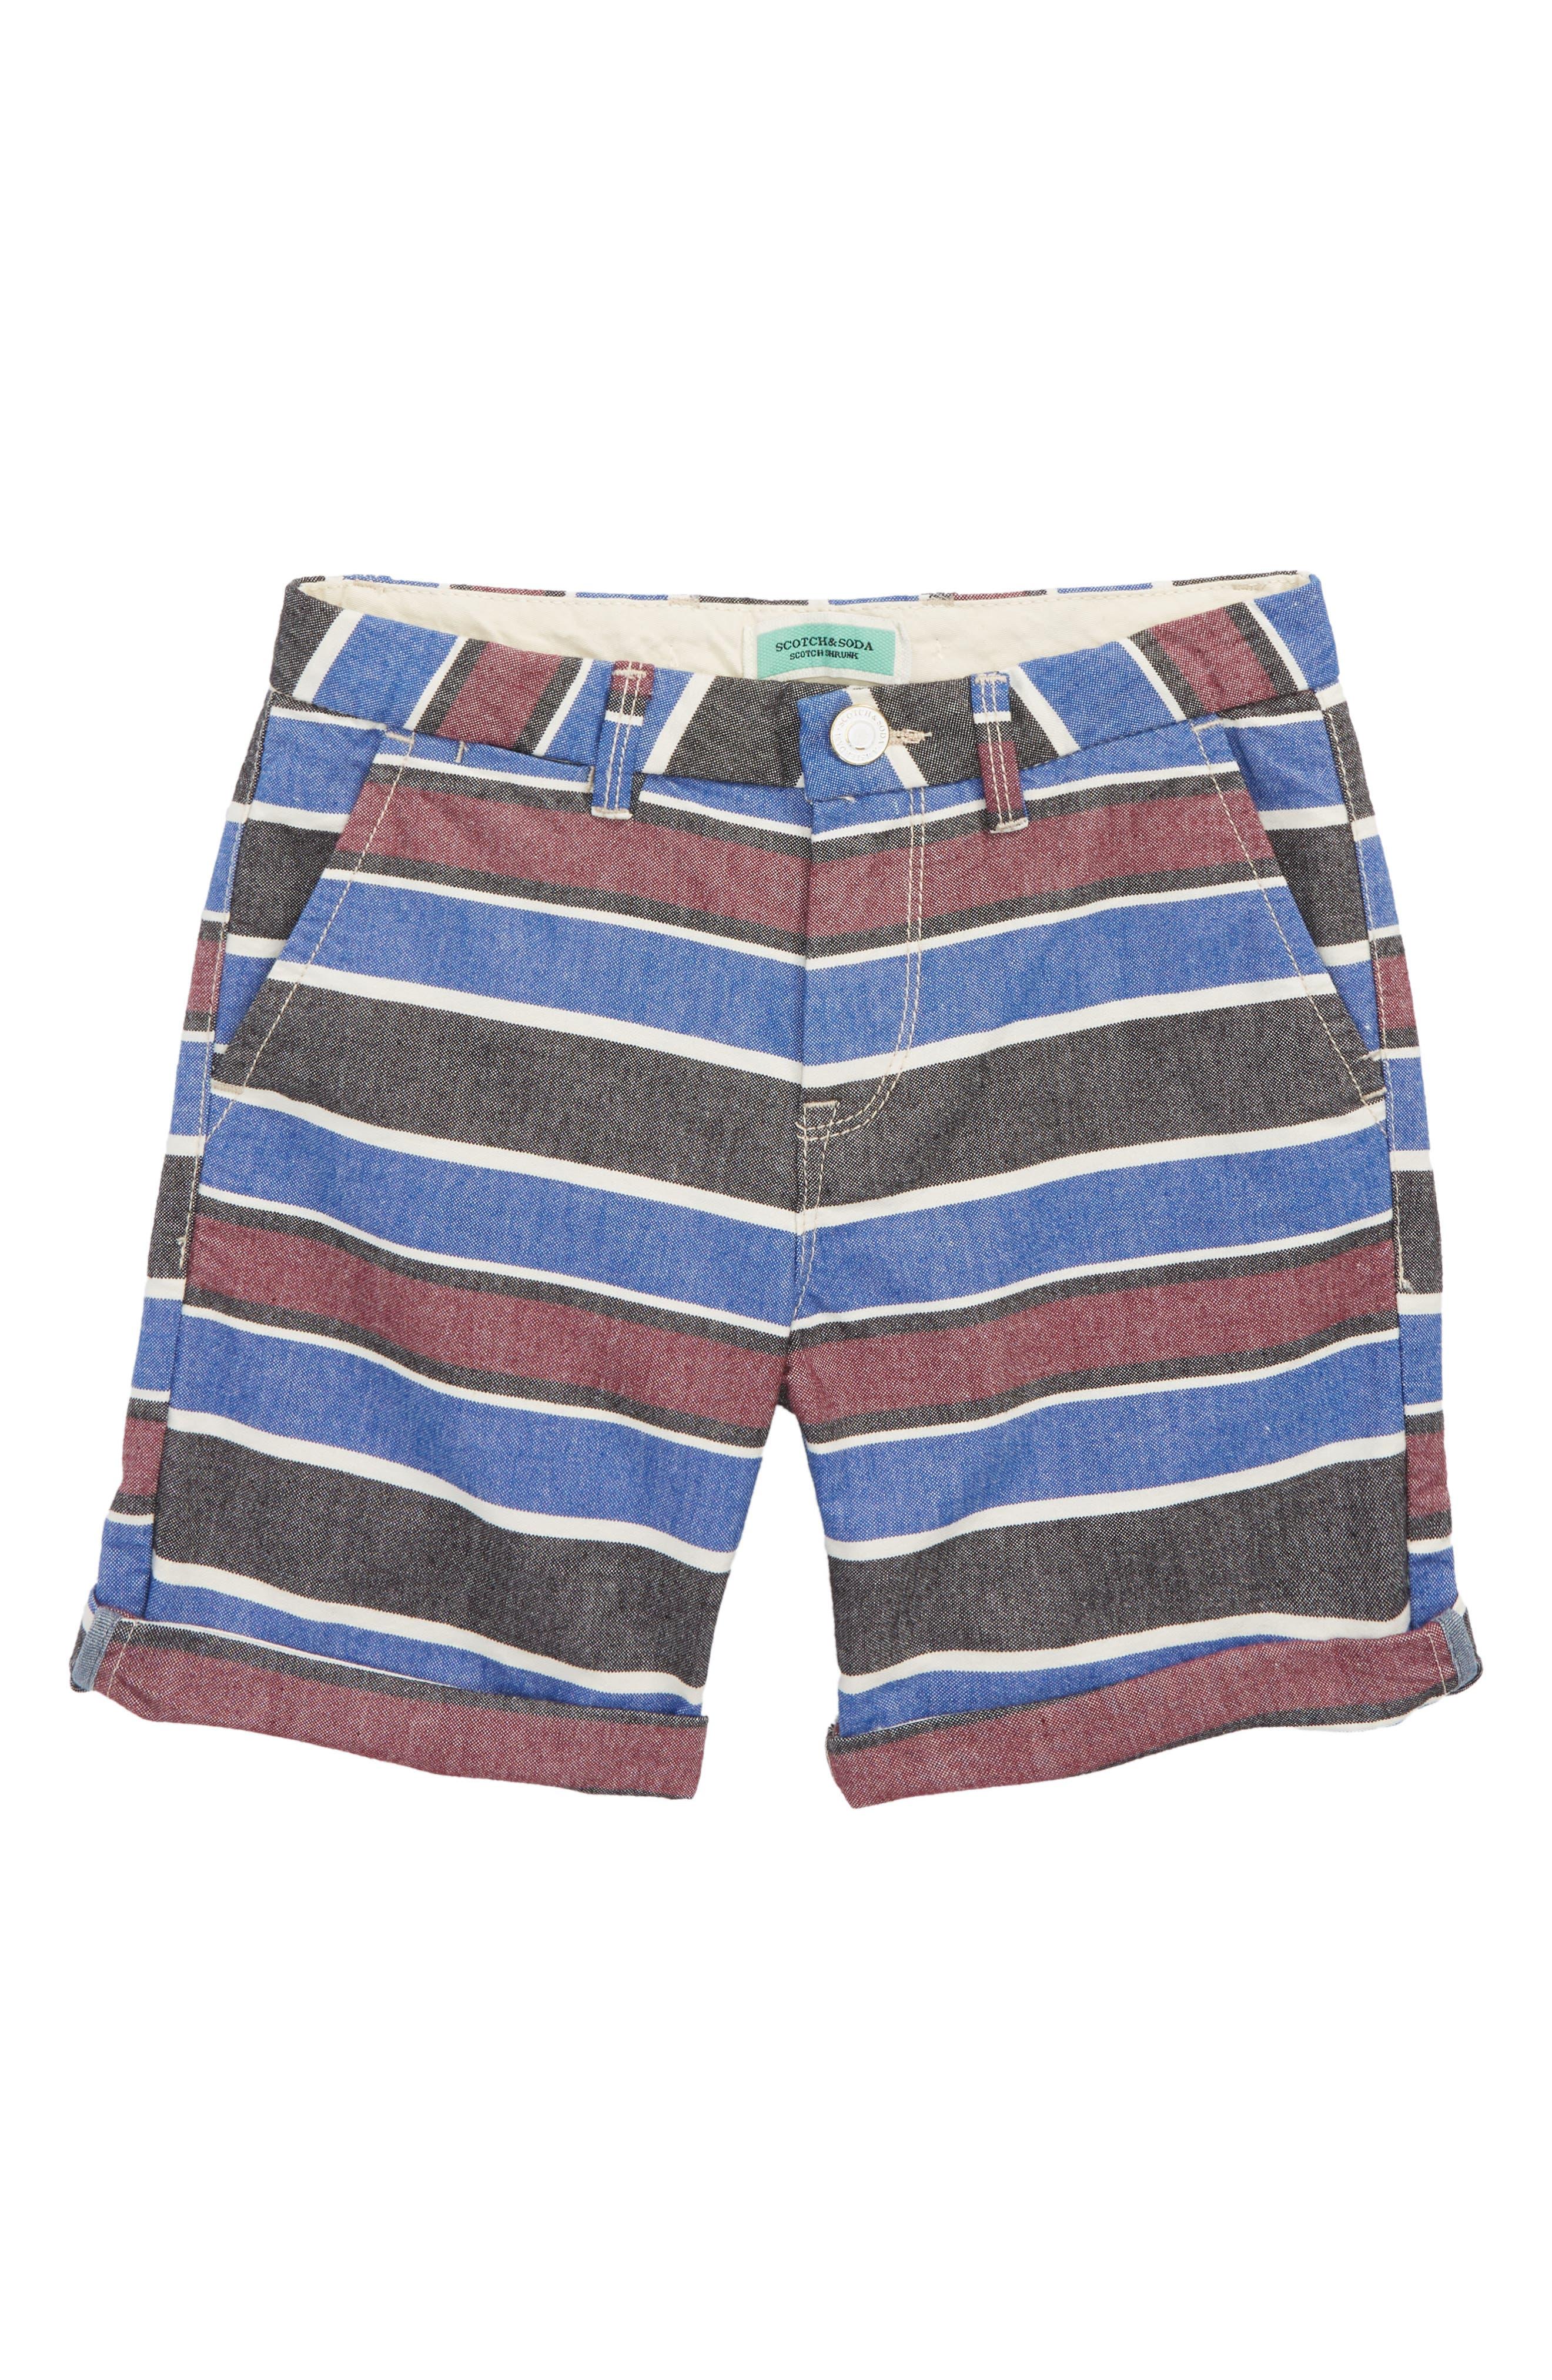 Stripe Chino Shorts,                             Main thumbnail 1, color,                             Combo Stripes